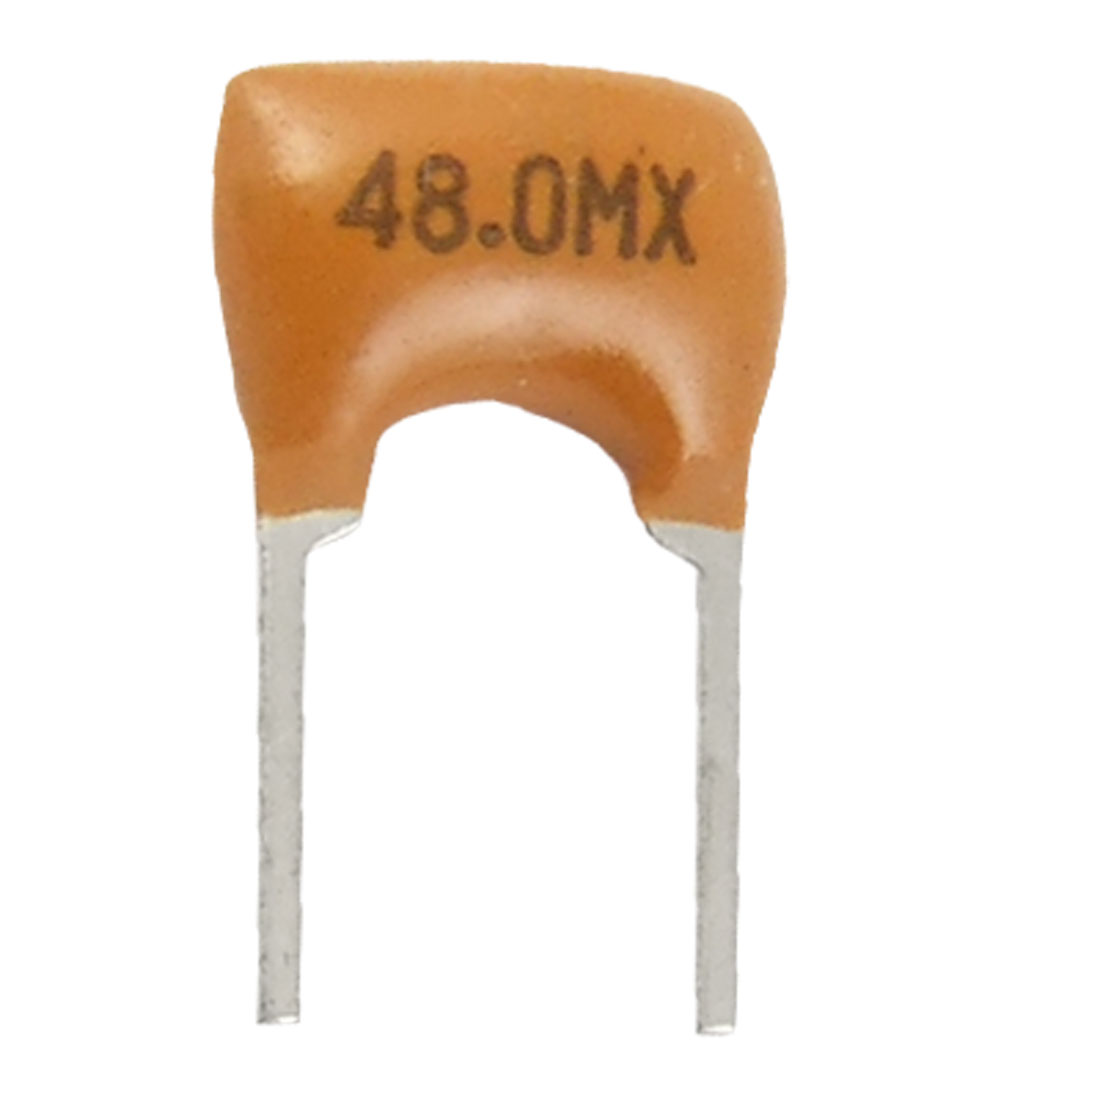 100 Pcs 48 MHz 5mm Pitch 2 Terminals FM Receiver Ceramic Filters